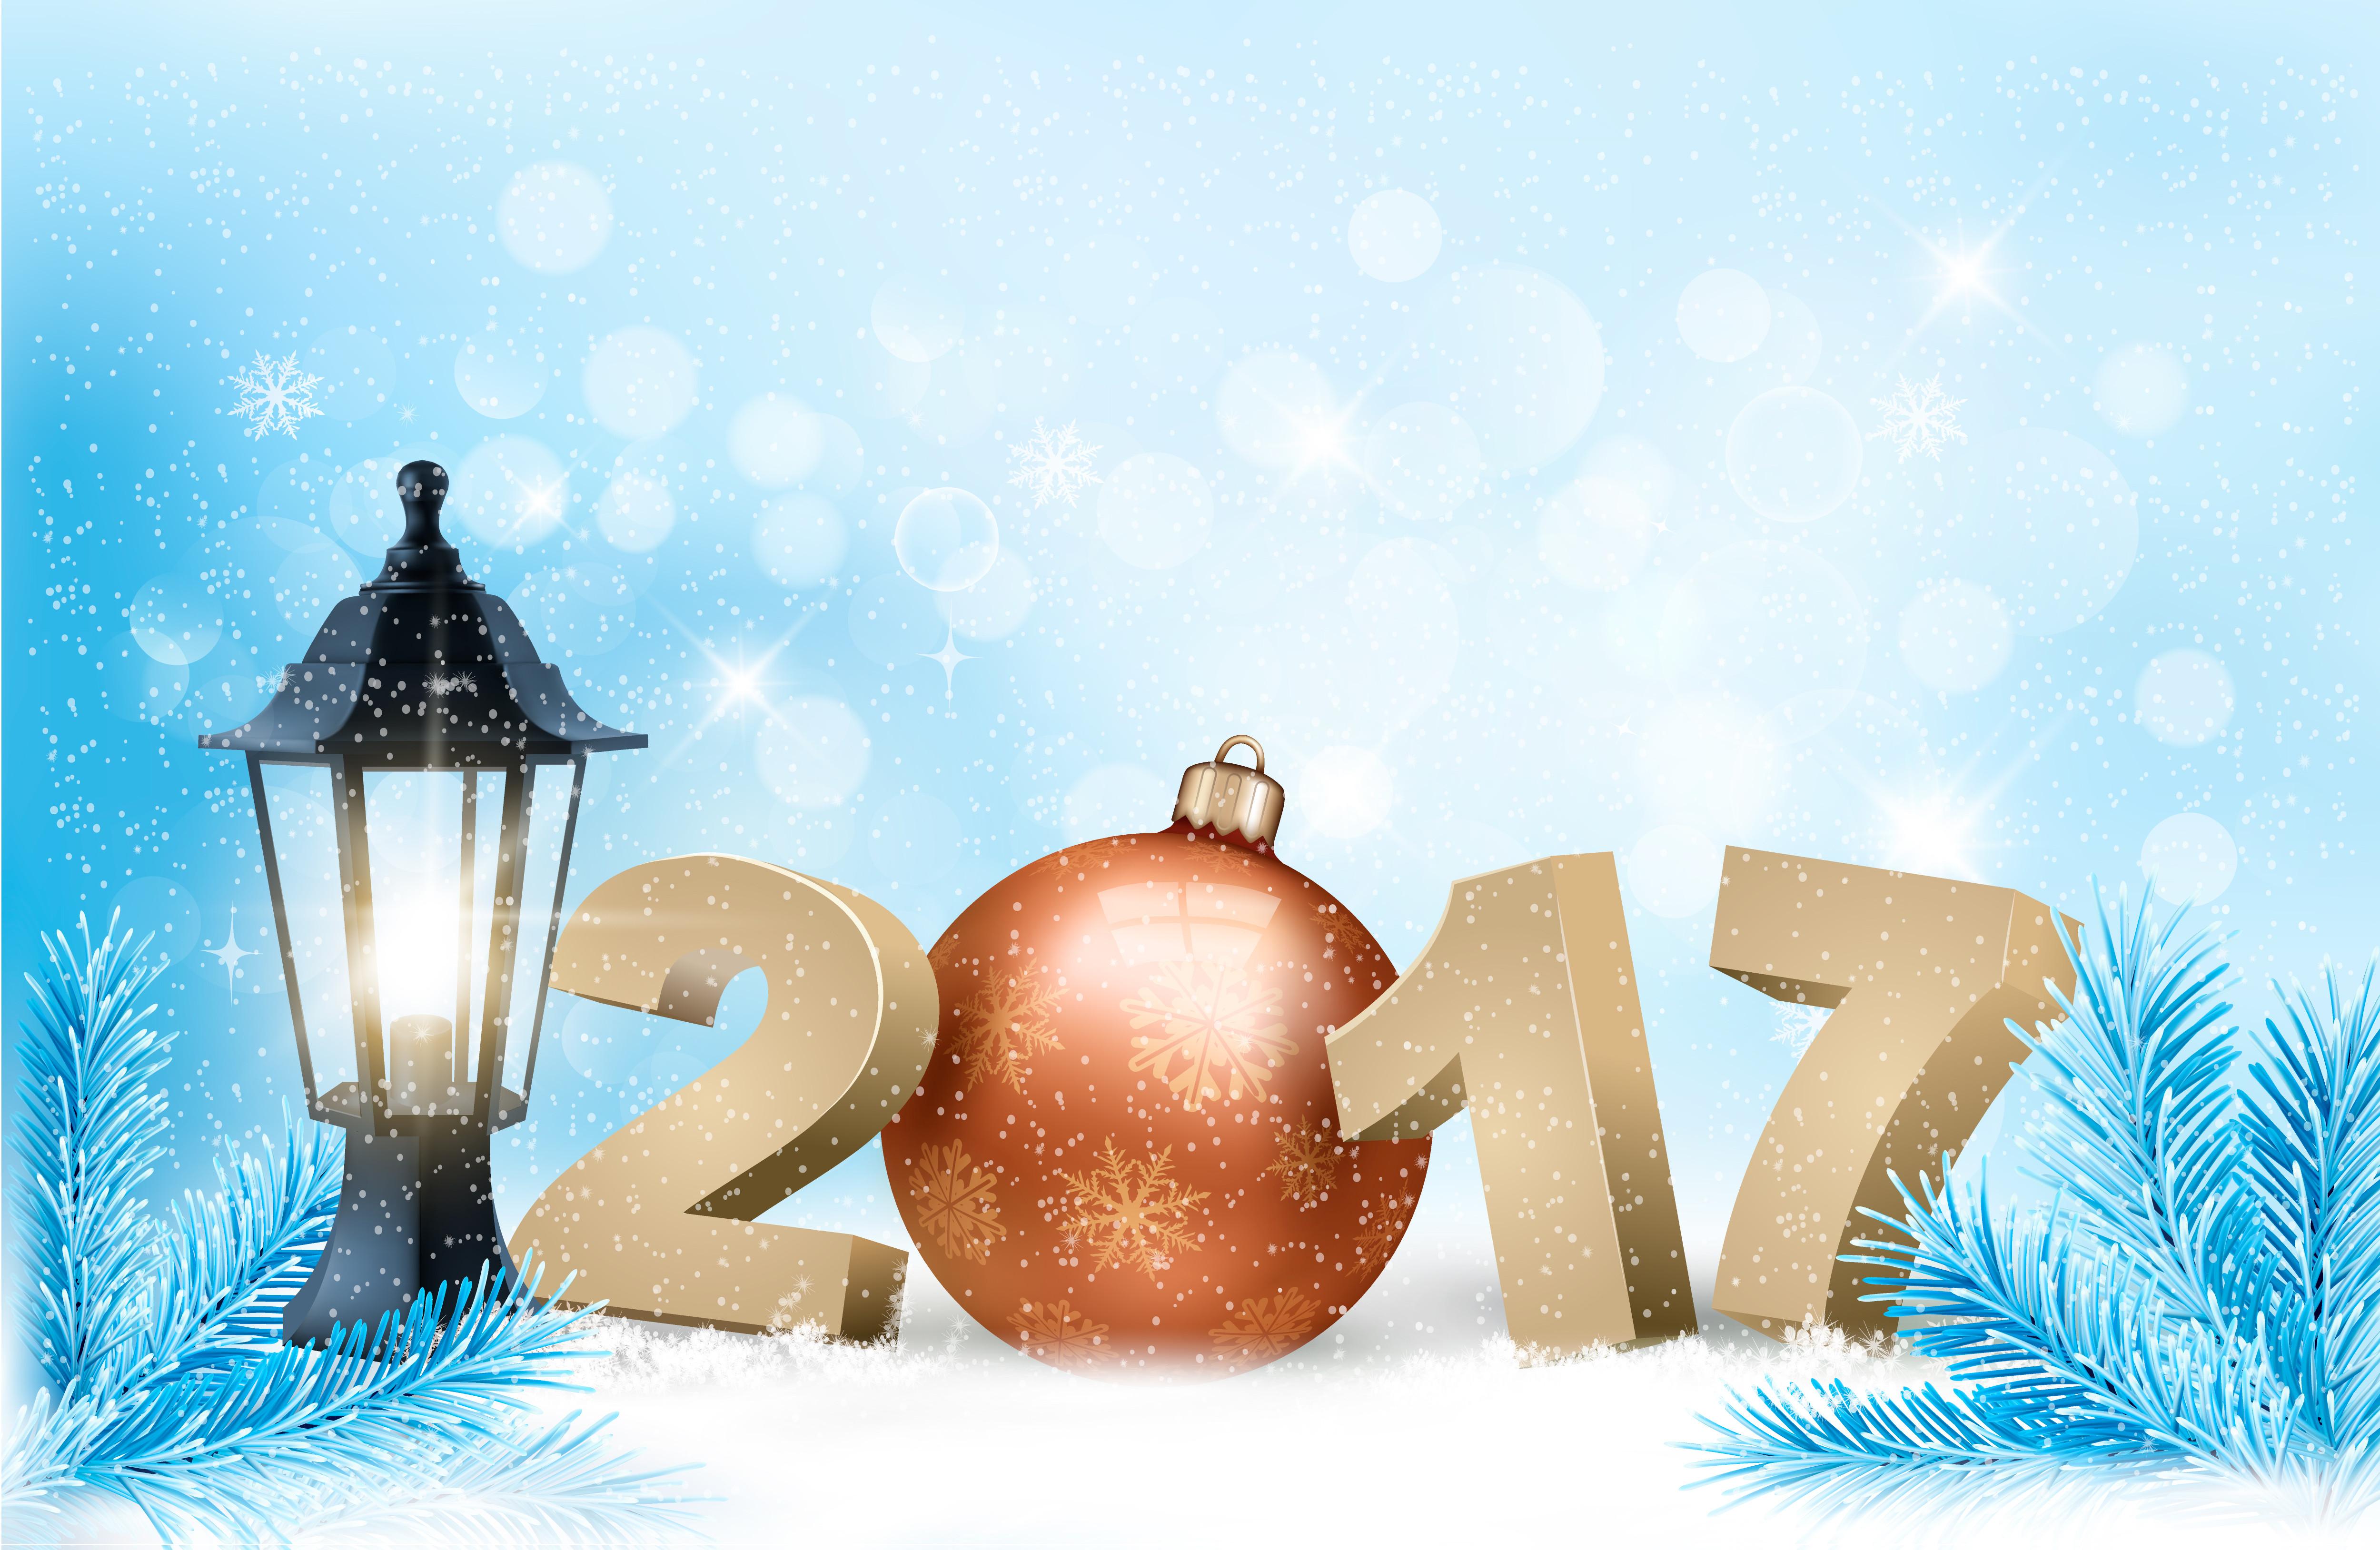 с новым 2017 годом, 2017, с новым годом